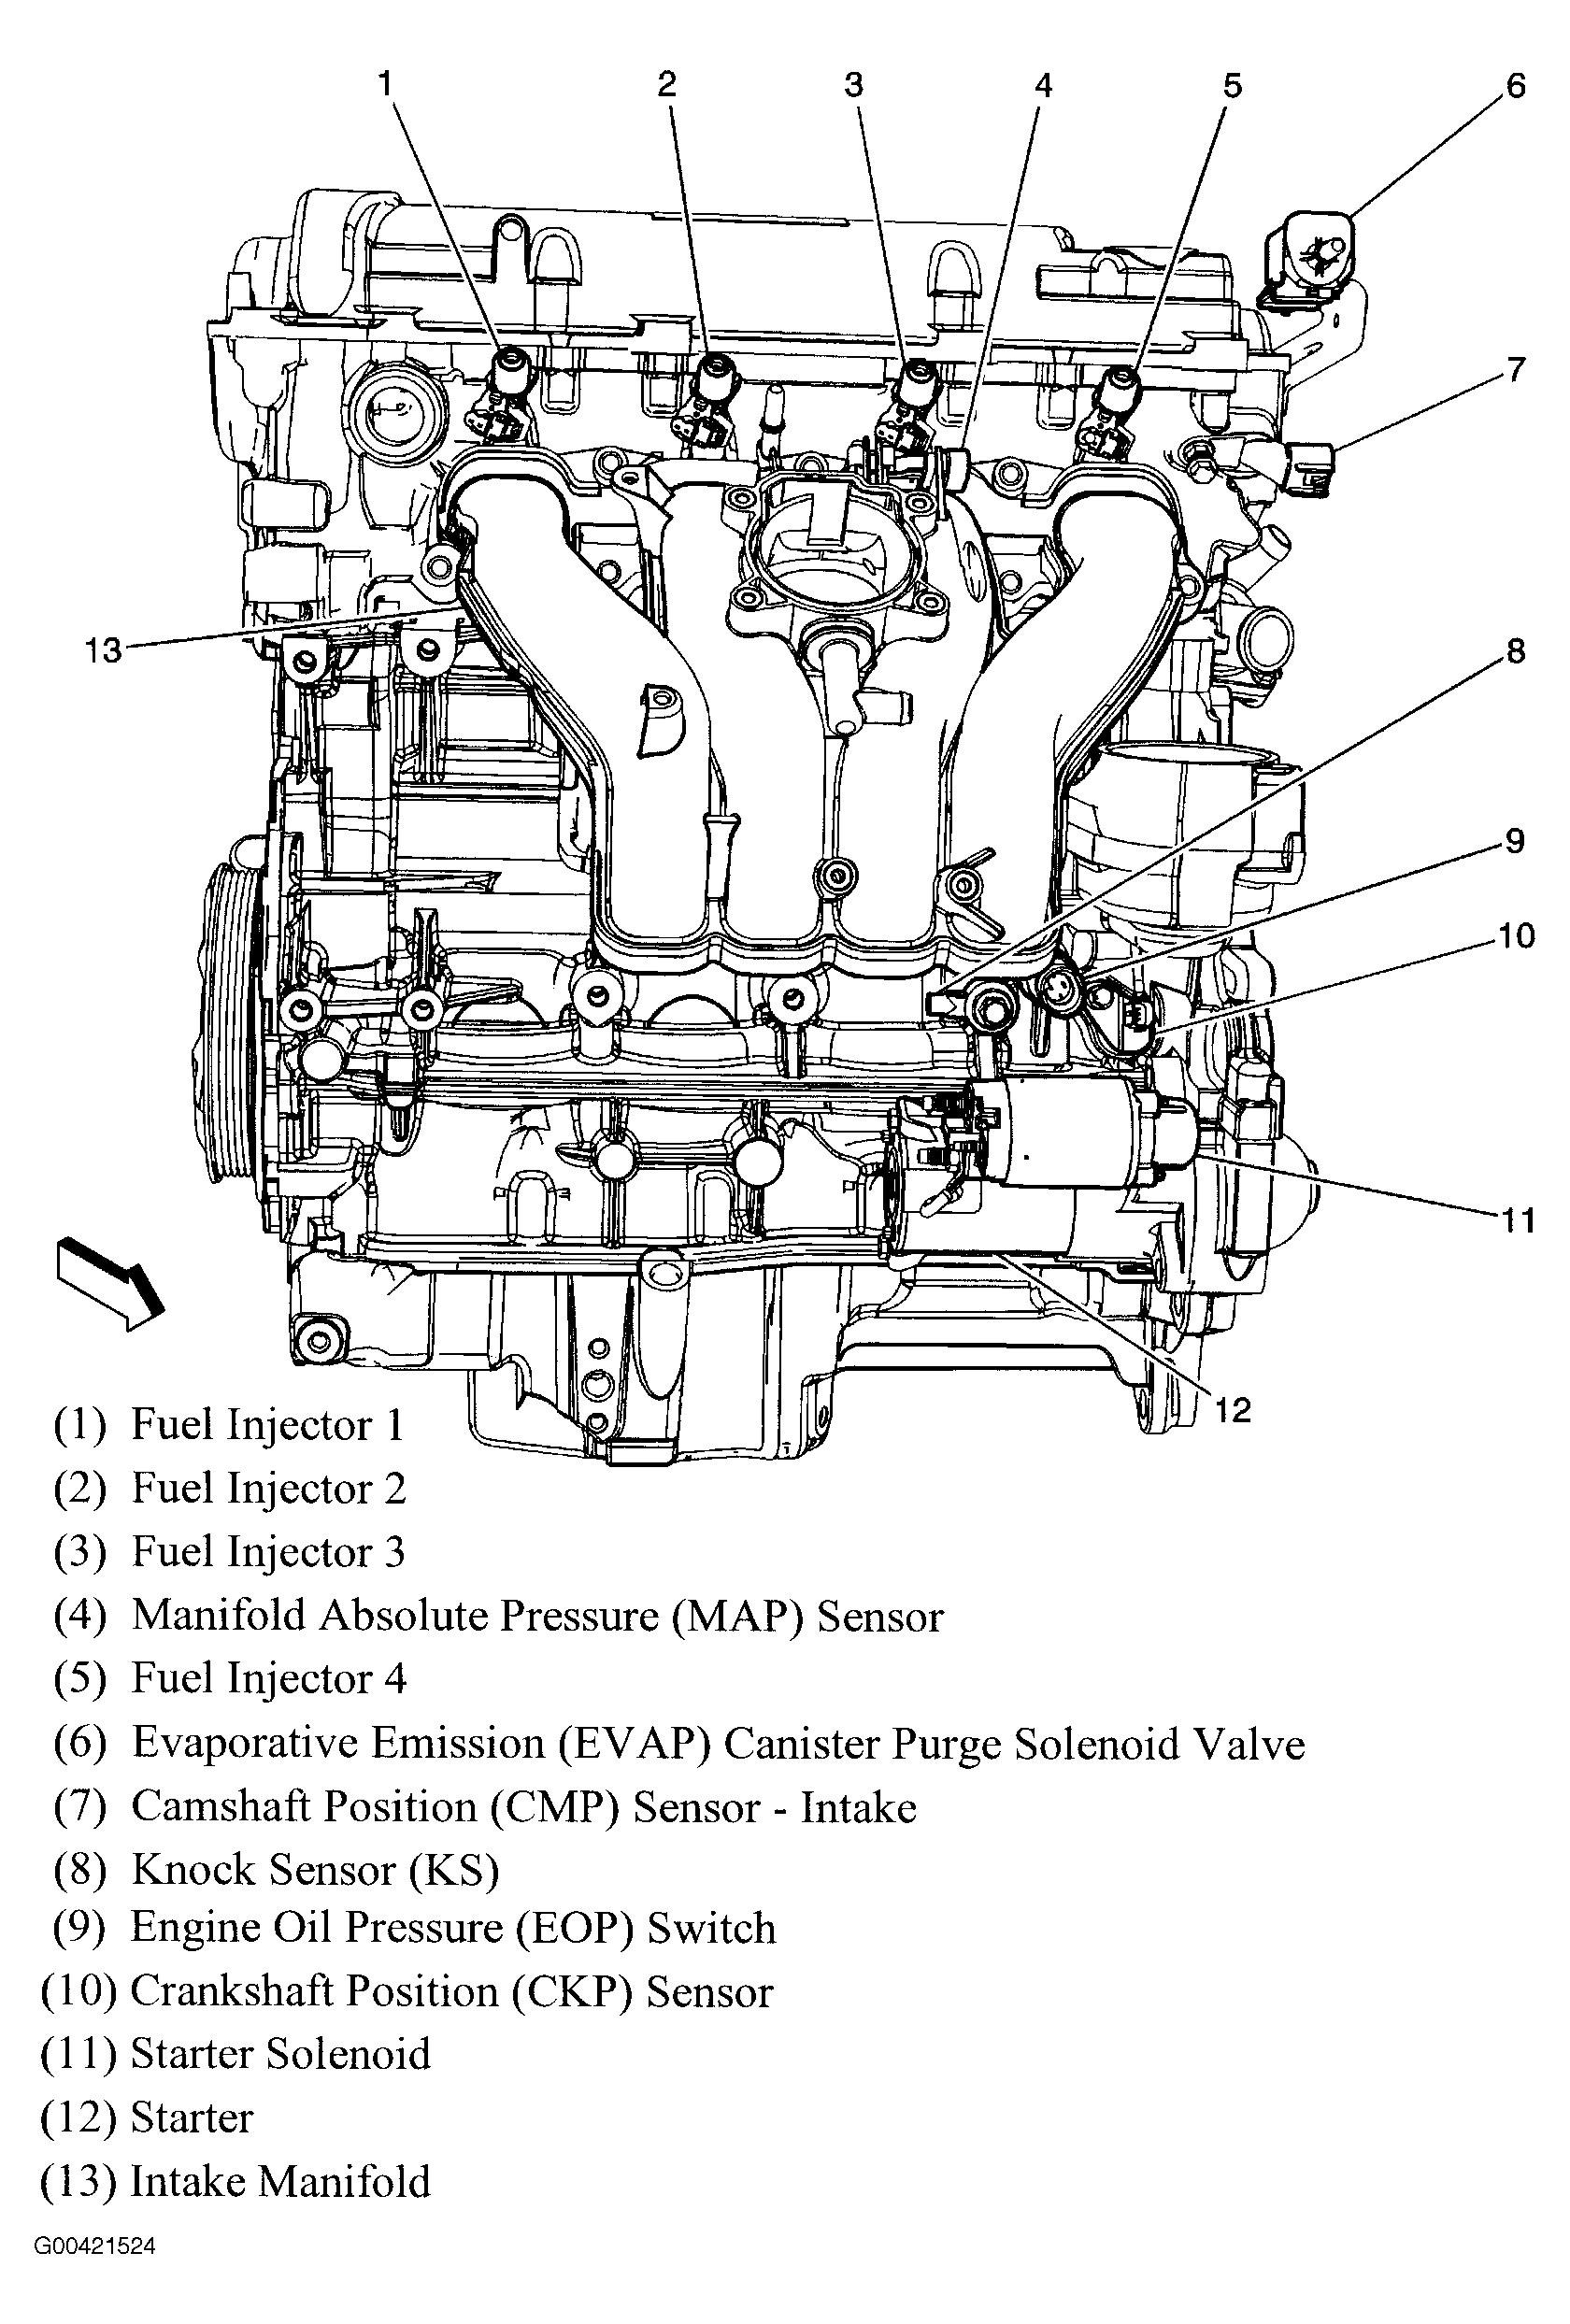 Pleasant 2001 Chevy Tahoe Radiator Diagram Unique 2000 Chevy Cavalier Cooling Wiring Cloud Rometaidewilluminateatxorg